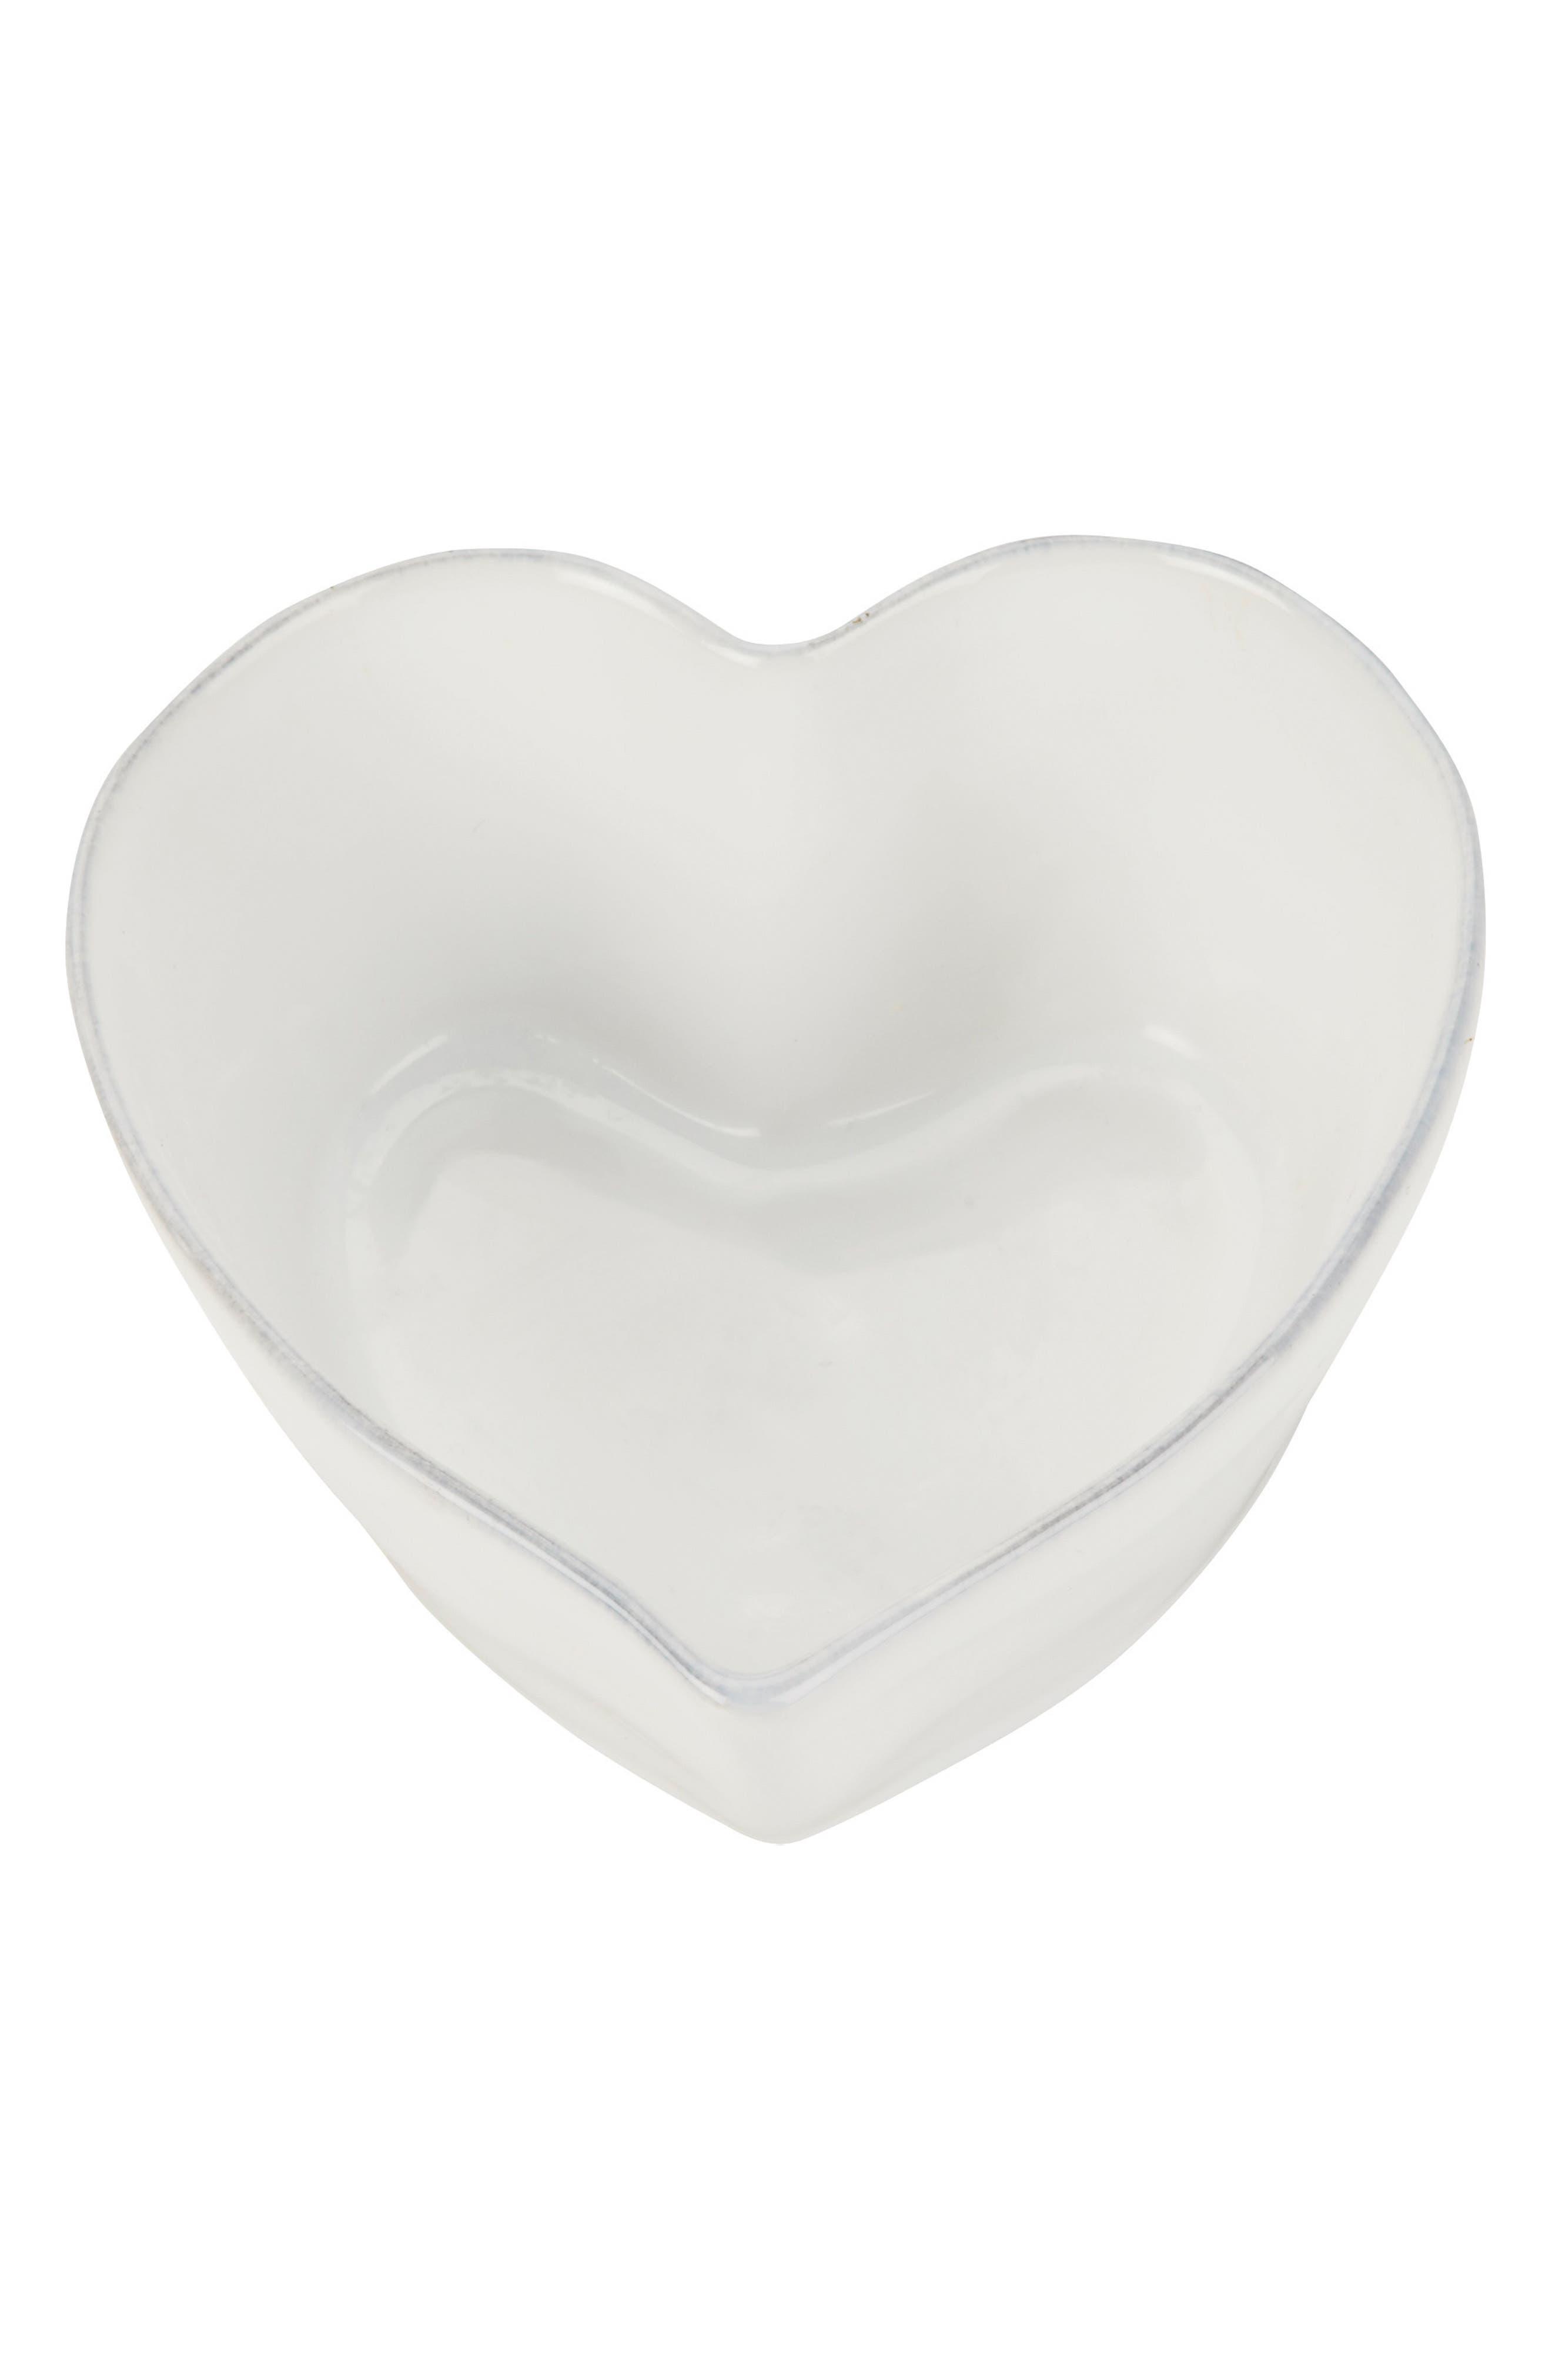 THE WHITE COMPANY, Porto Stoneware Heart Roaster, Main thumbnail 1, color, WHITE